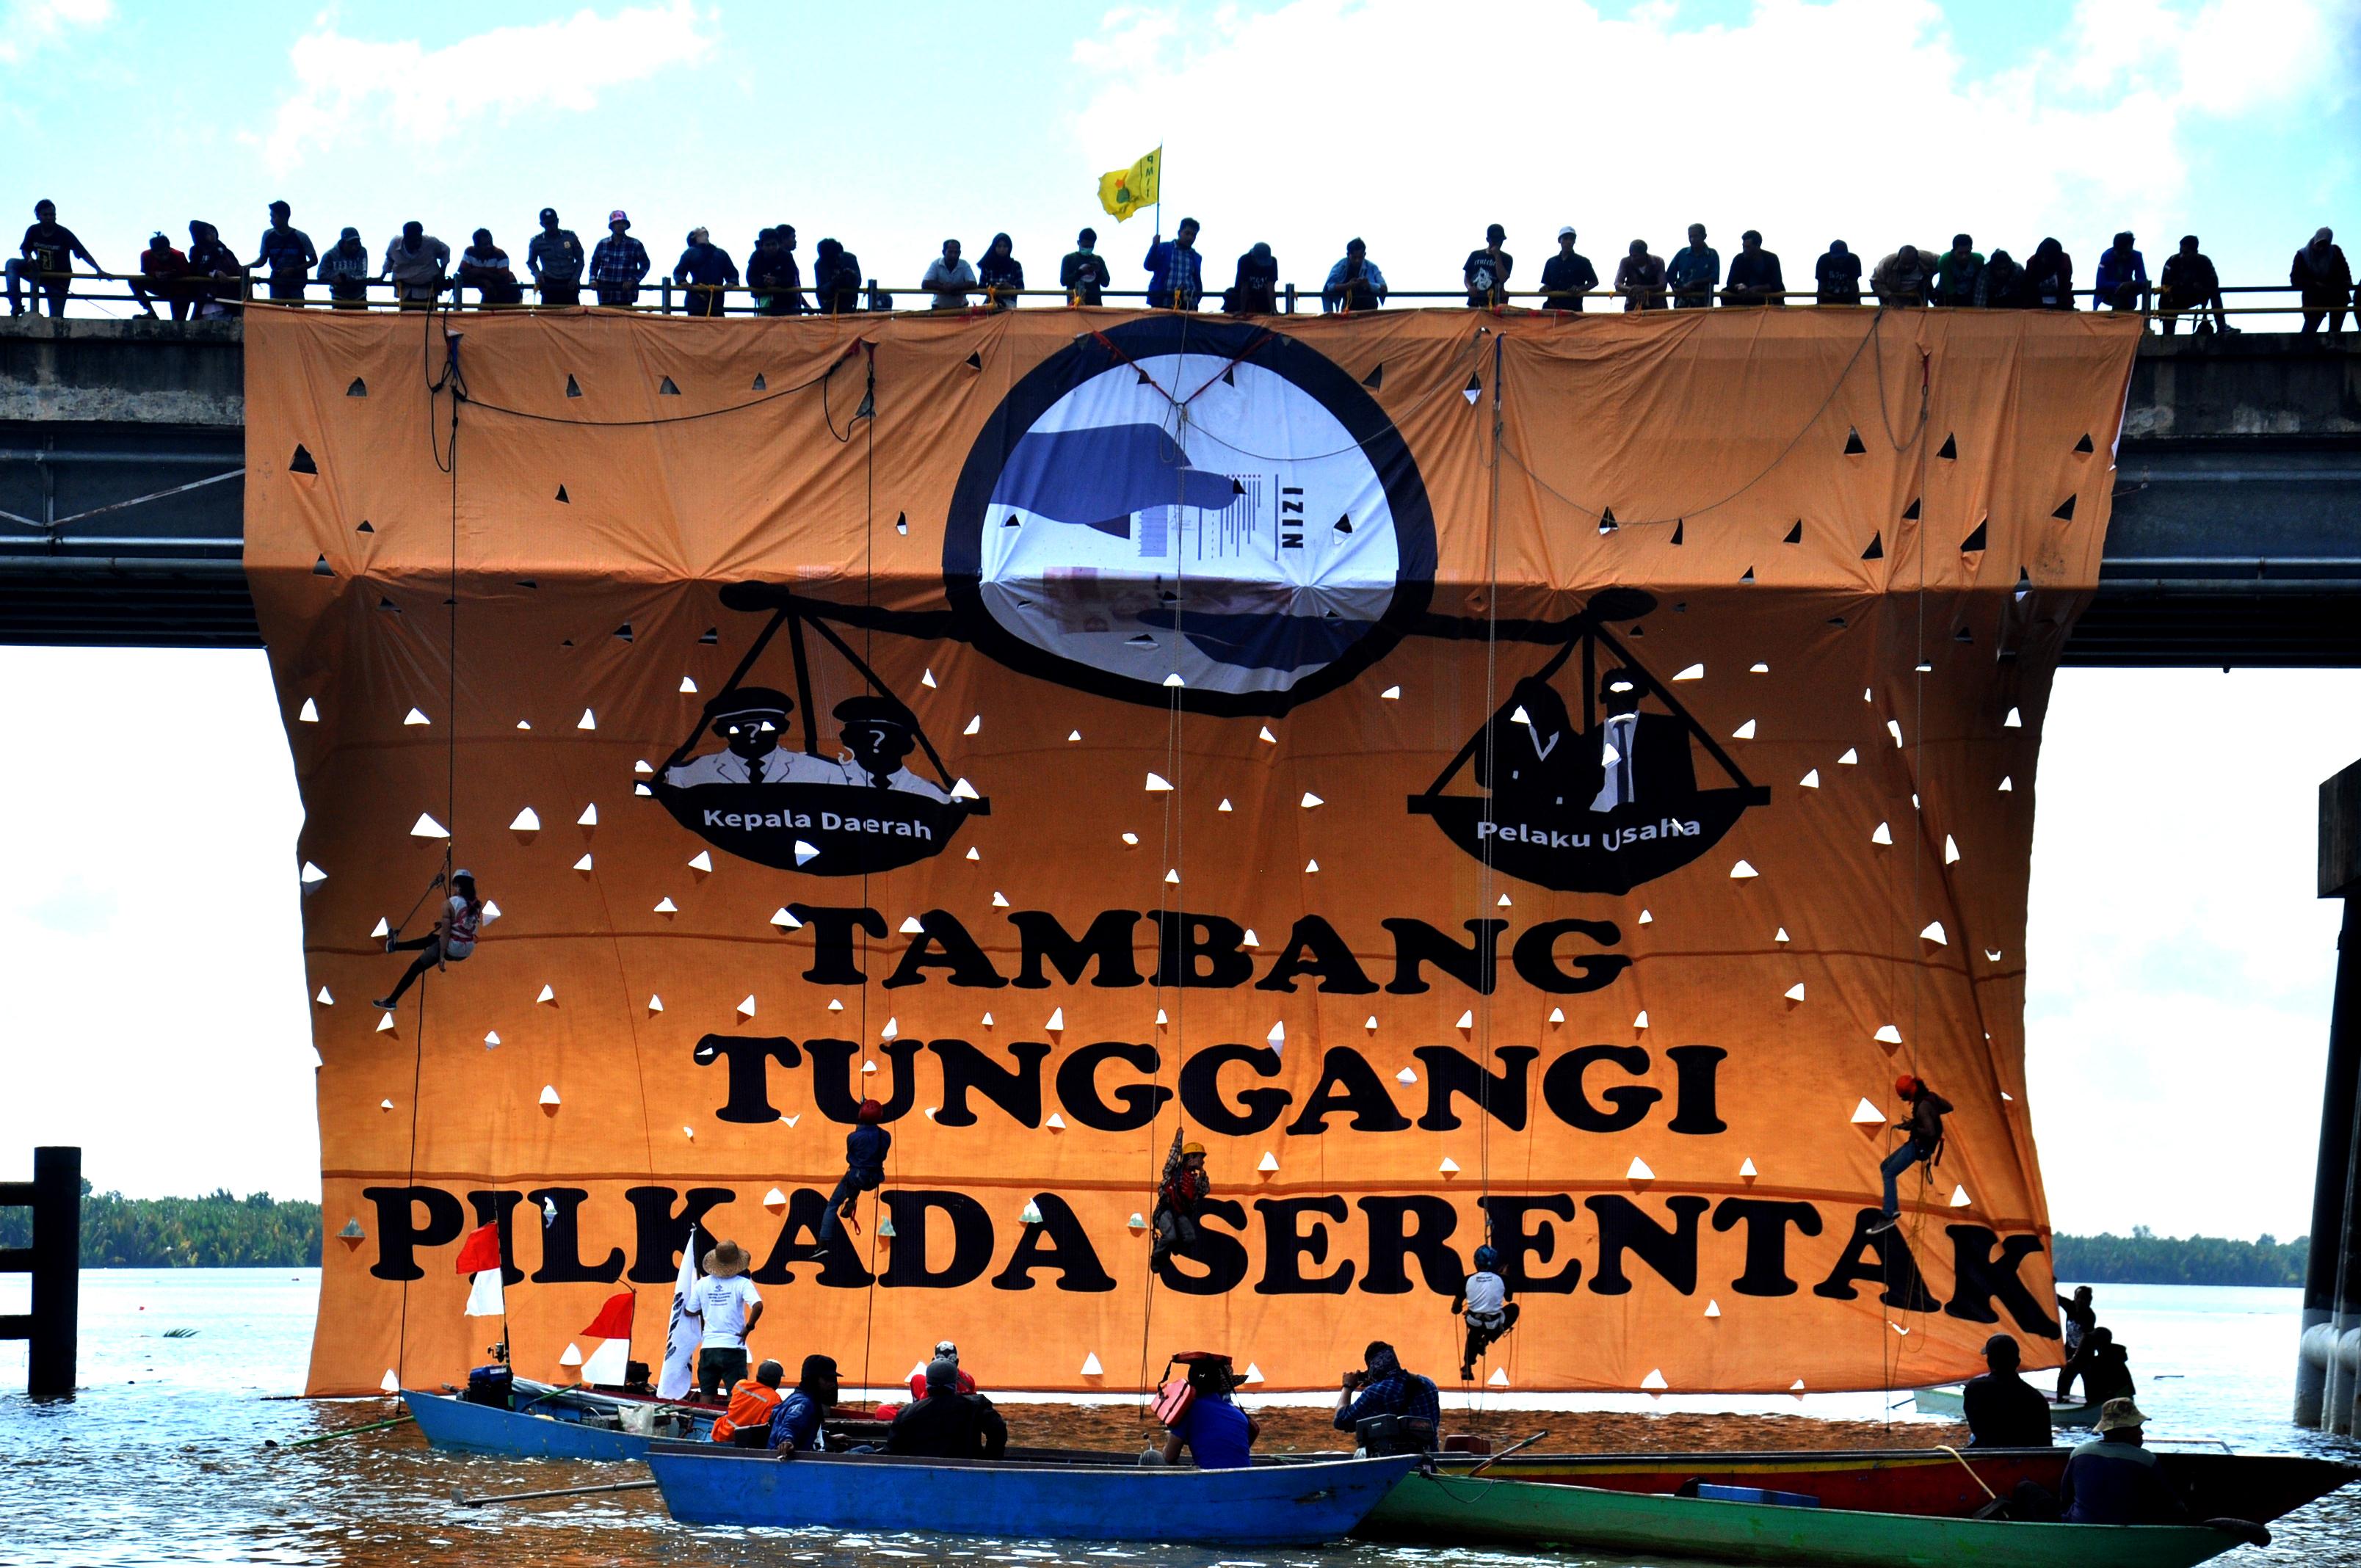 Aksi Blokade Tongkang Batubara yang dilakukan Koalisi Anti Mafia Tambang dan Sawit di Sungai Dondang, Kecamatan Muara Jawa, Kabupaten Kutai Kartanegara, kalimantan Timur